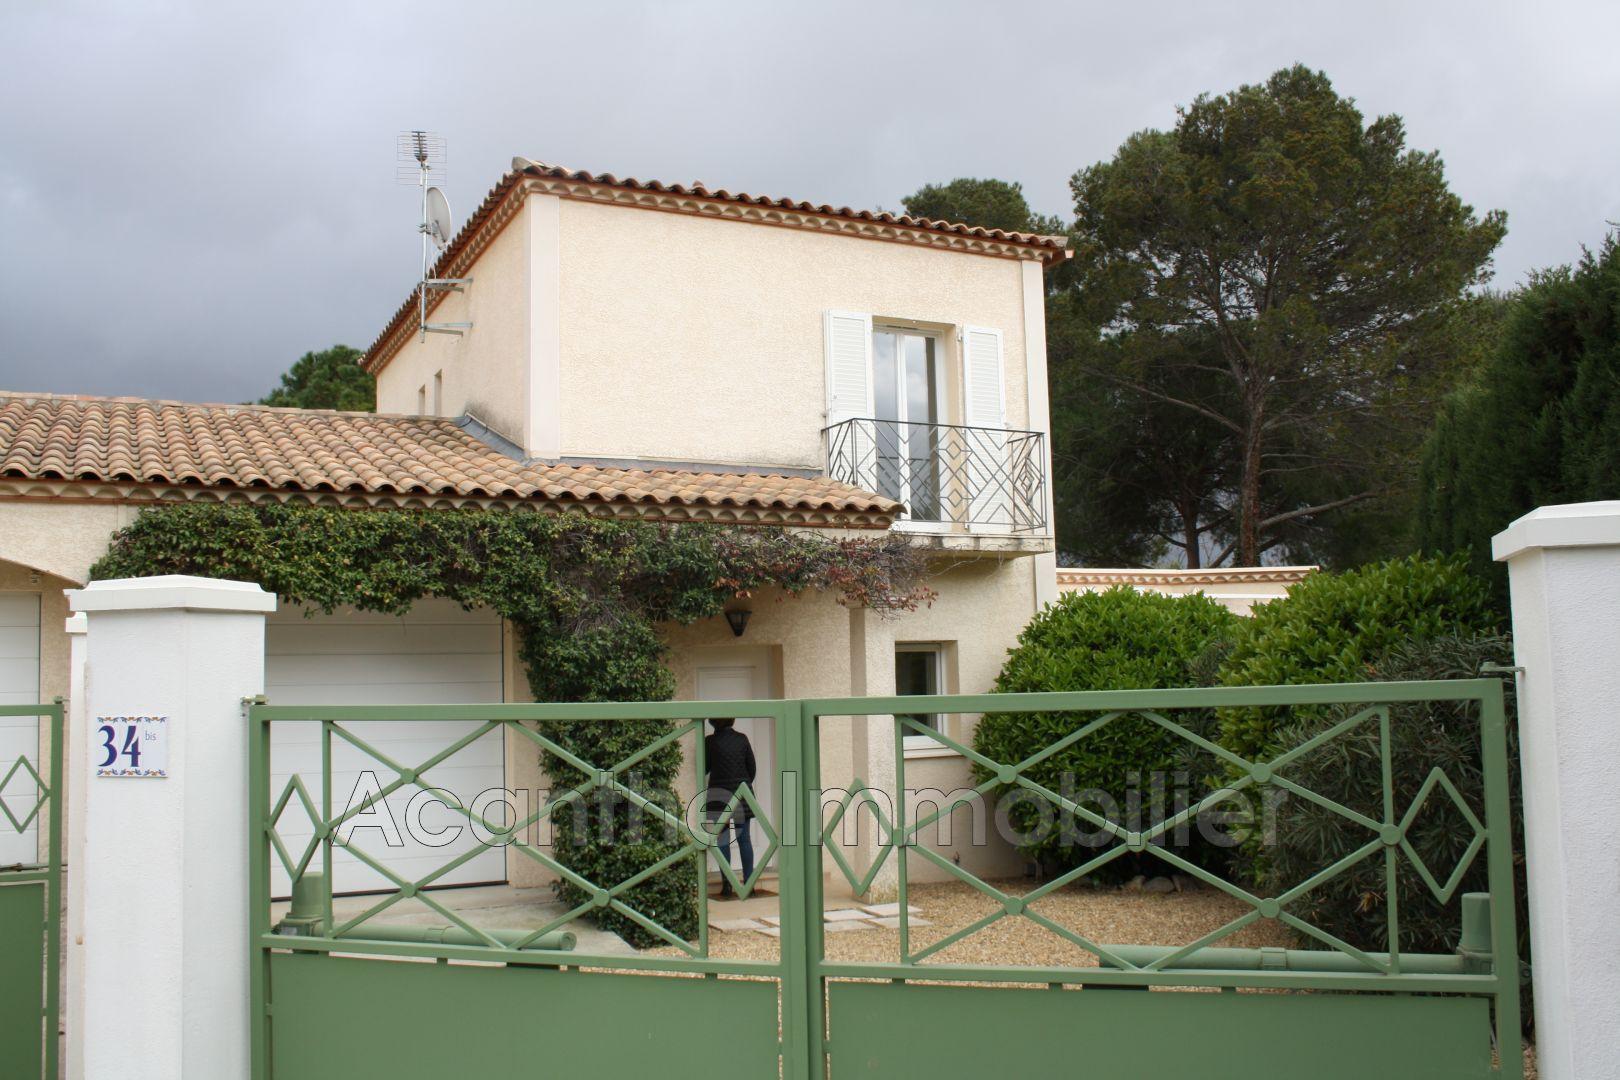 villa castelnau le lez location villa 3 bedroom 140 m. Black Bedroom Furniture Sets. Home Design Ideas